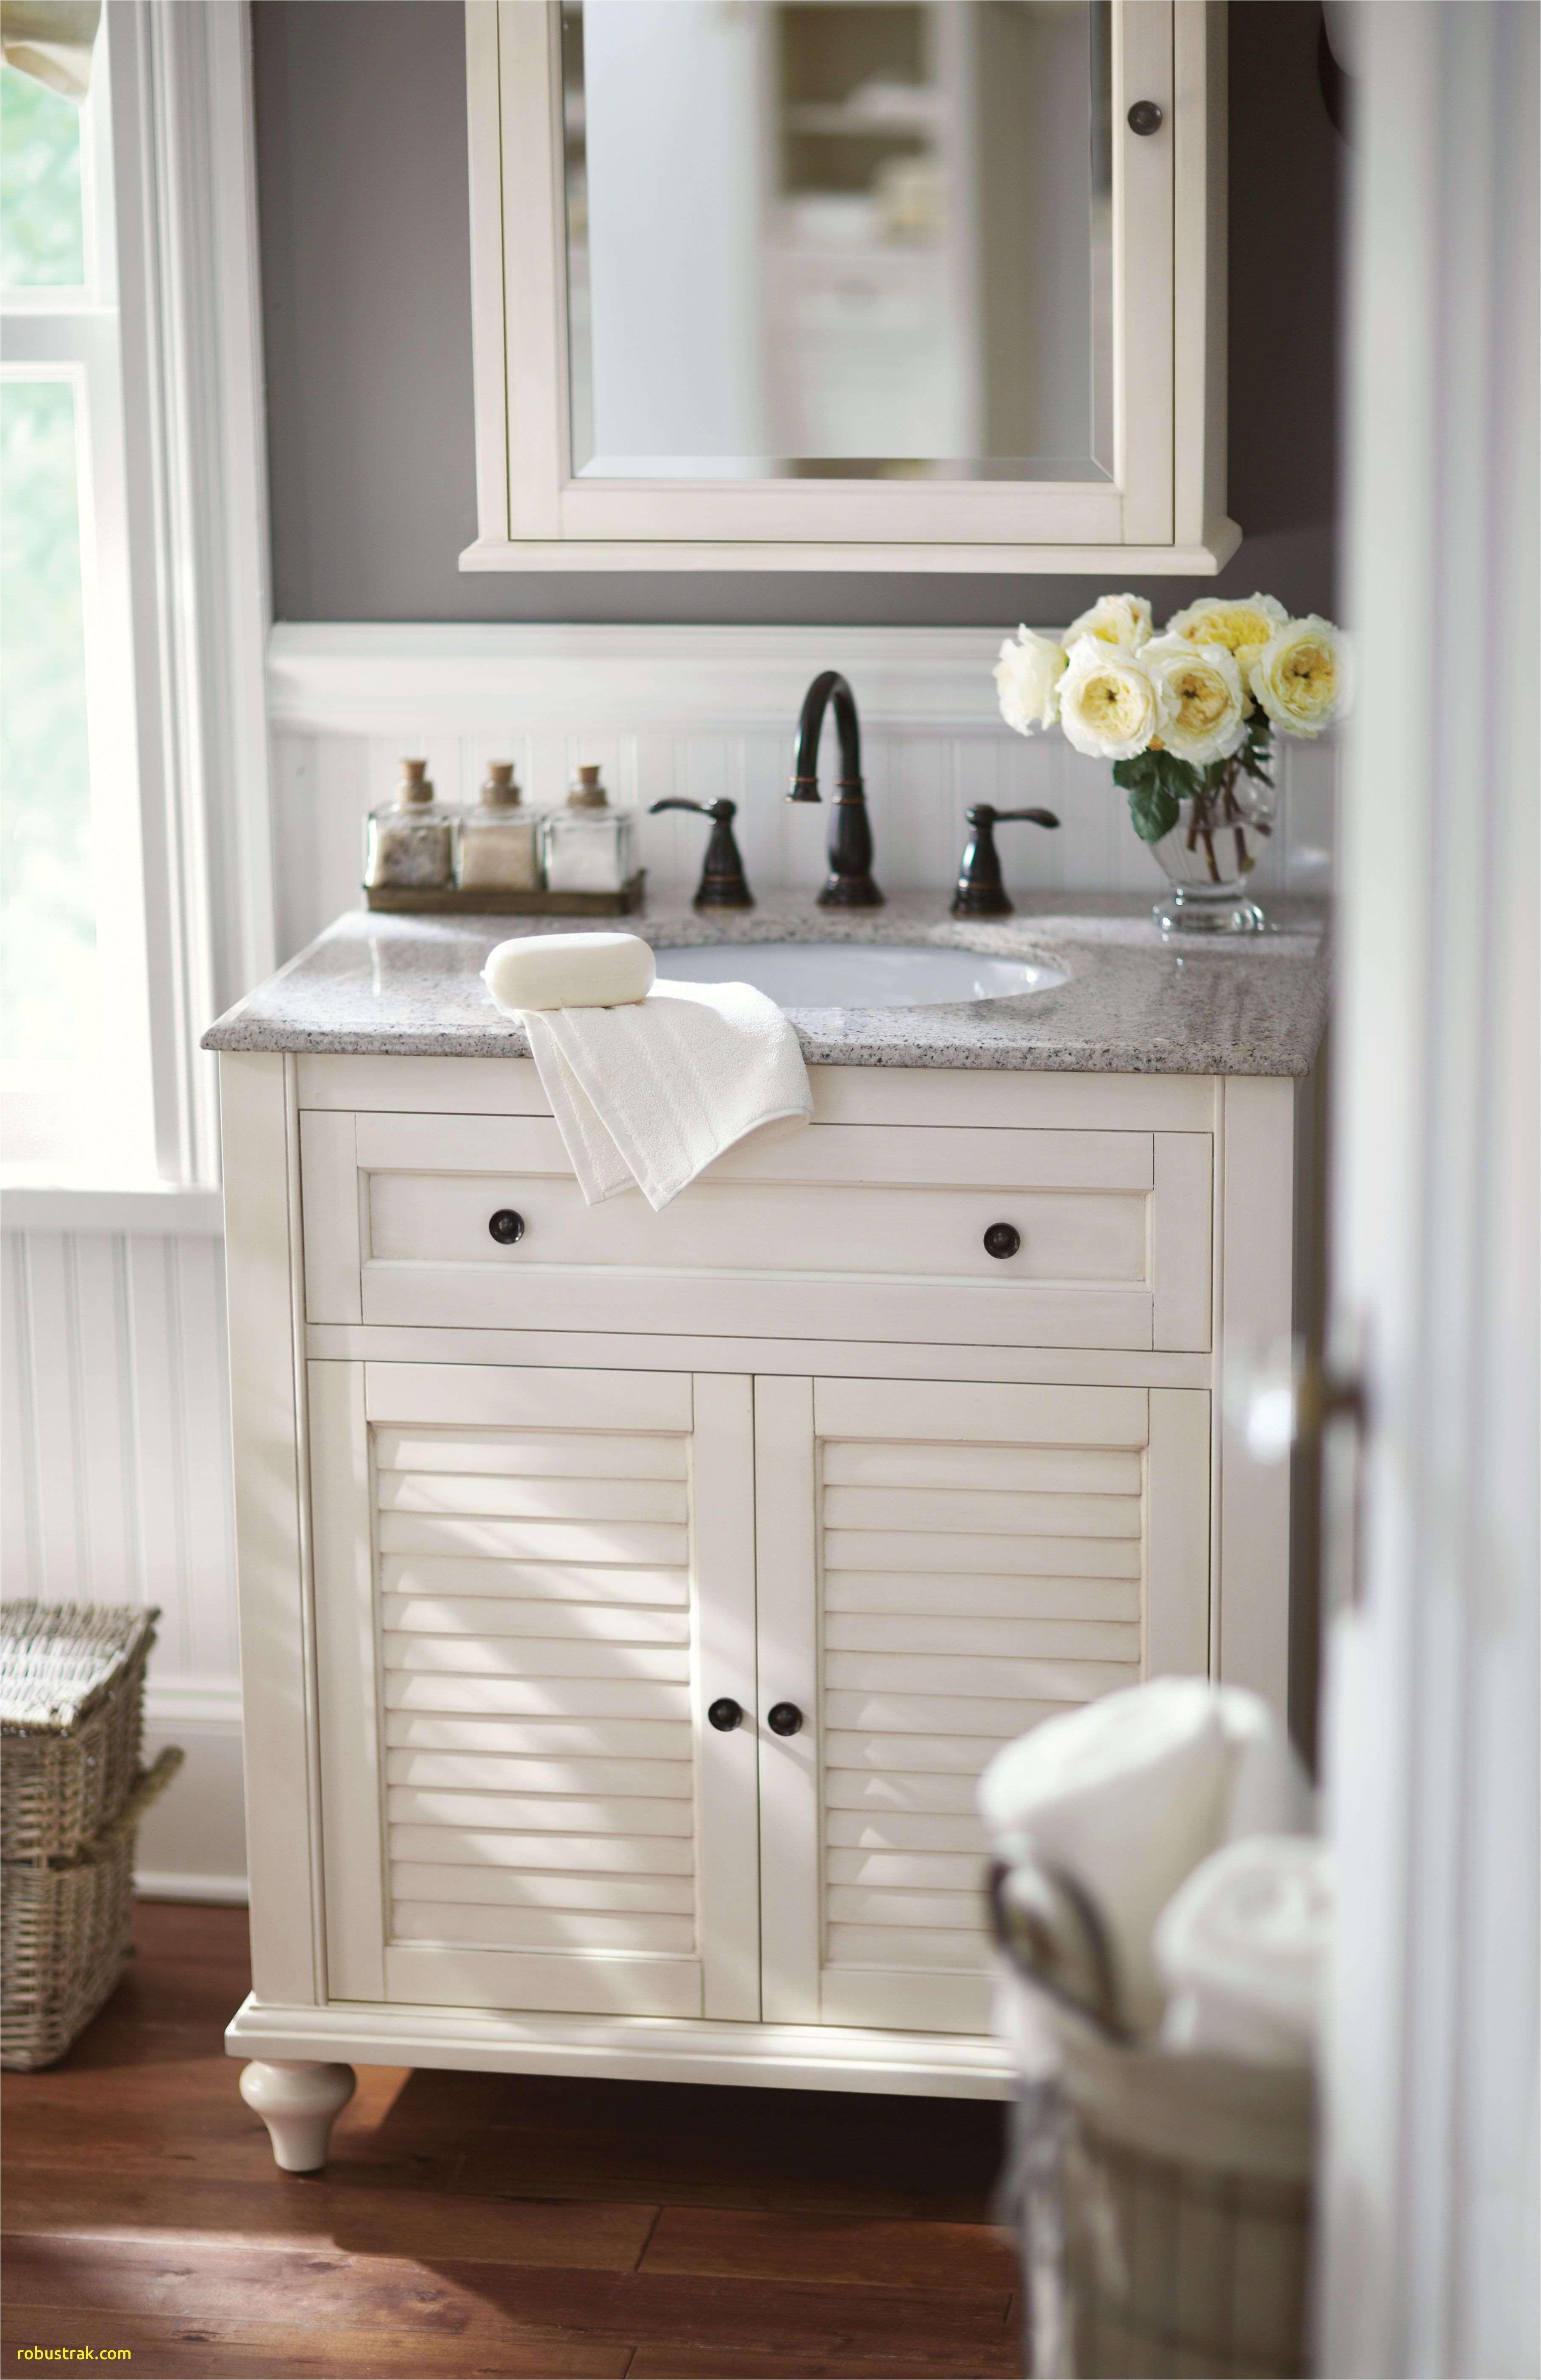 Bathroom Tiles Design Ideas for Small Bathrooms Awesome Small Bathroom Decoration Ideas In Bathroom Designs Bathroom